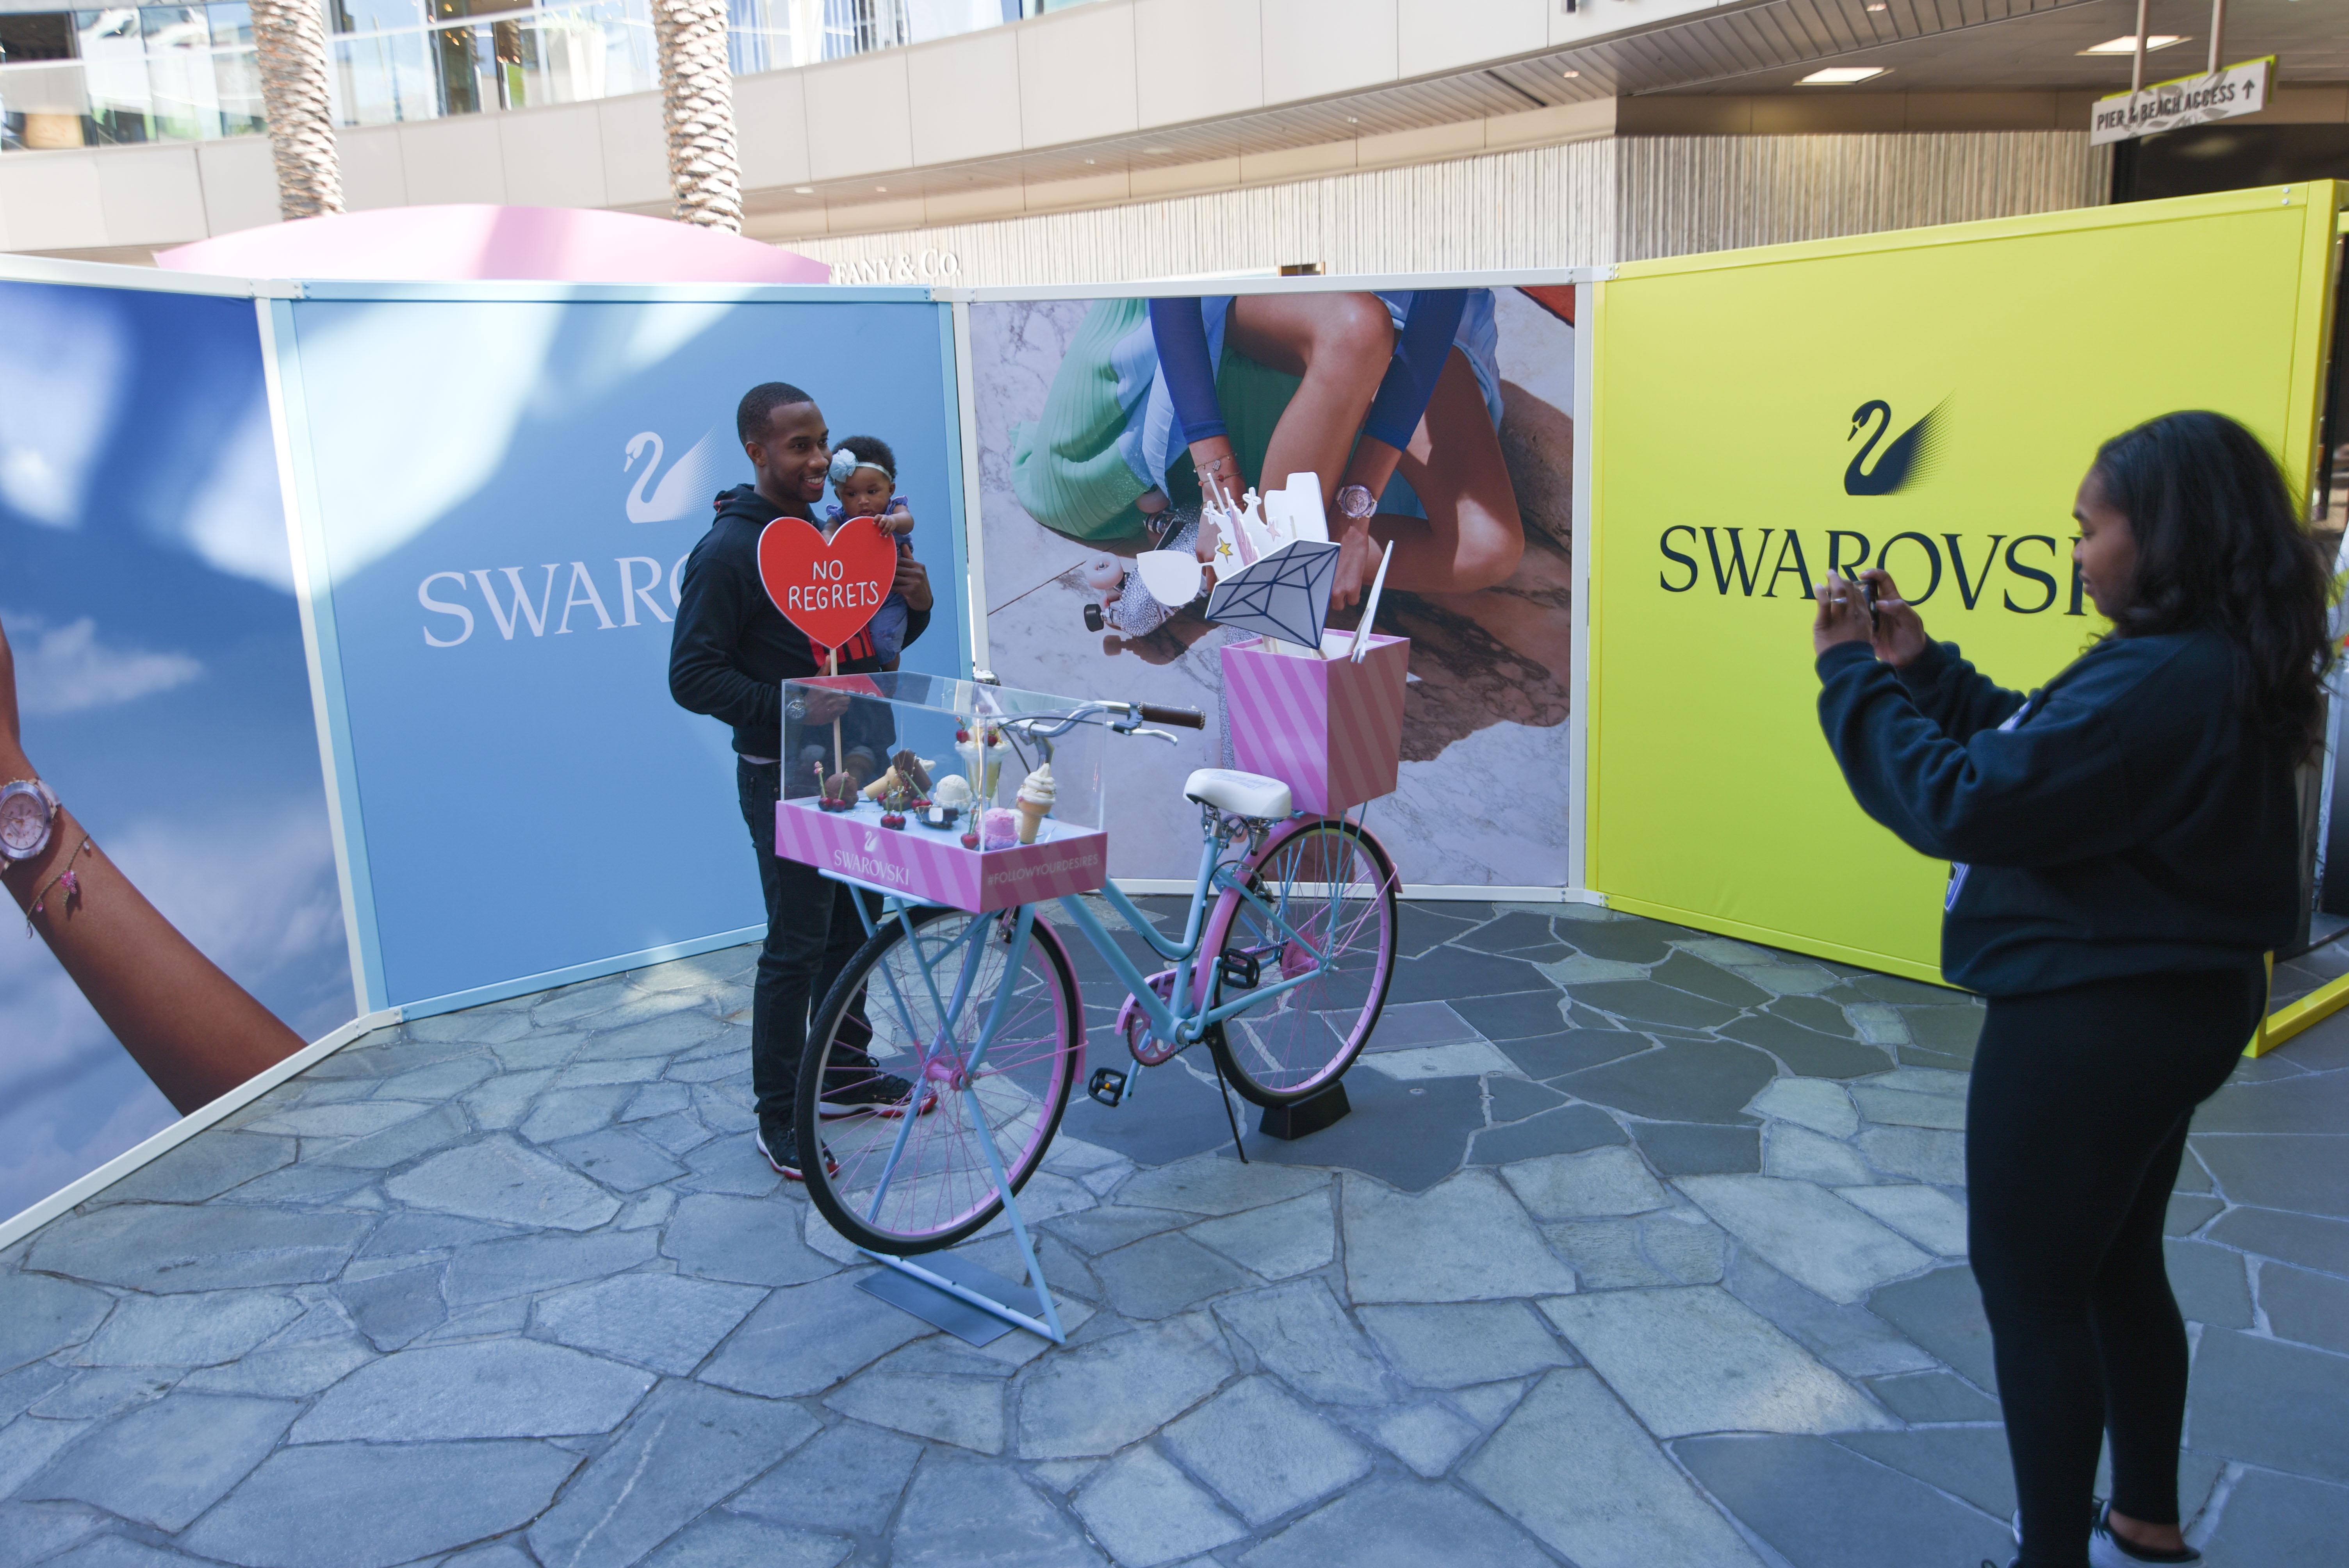 Swarovski pop-up store